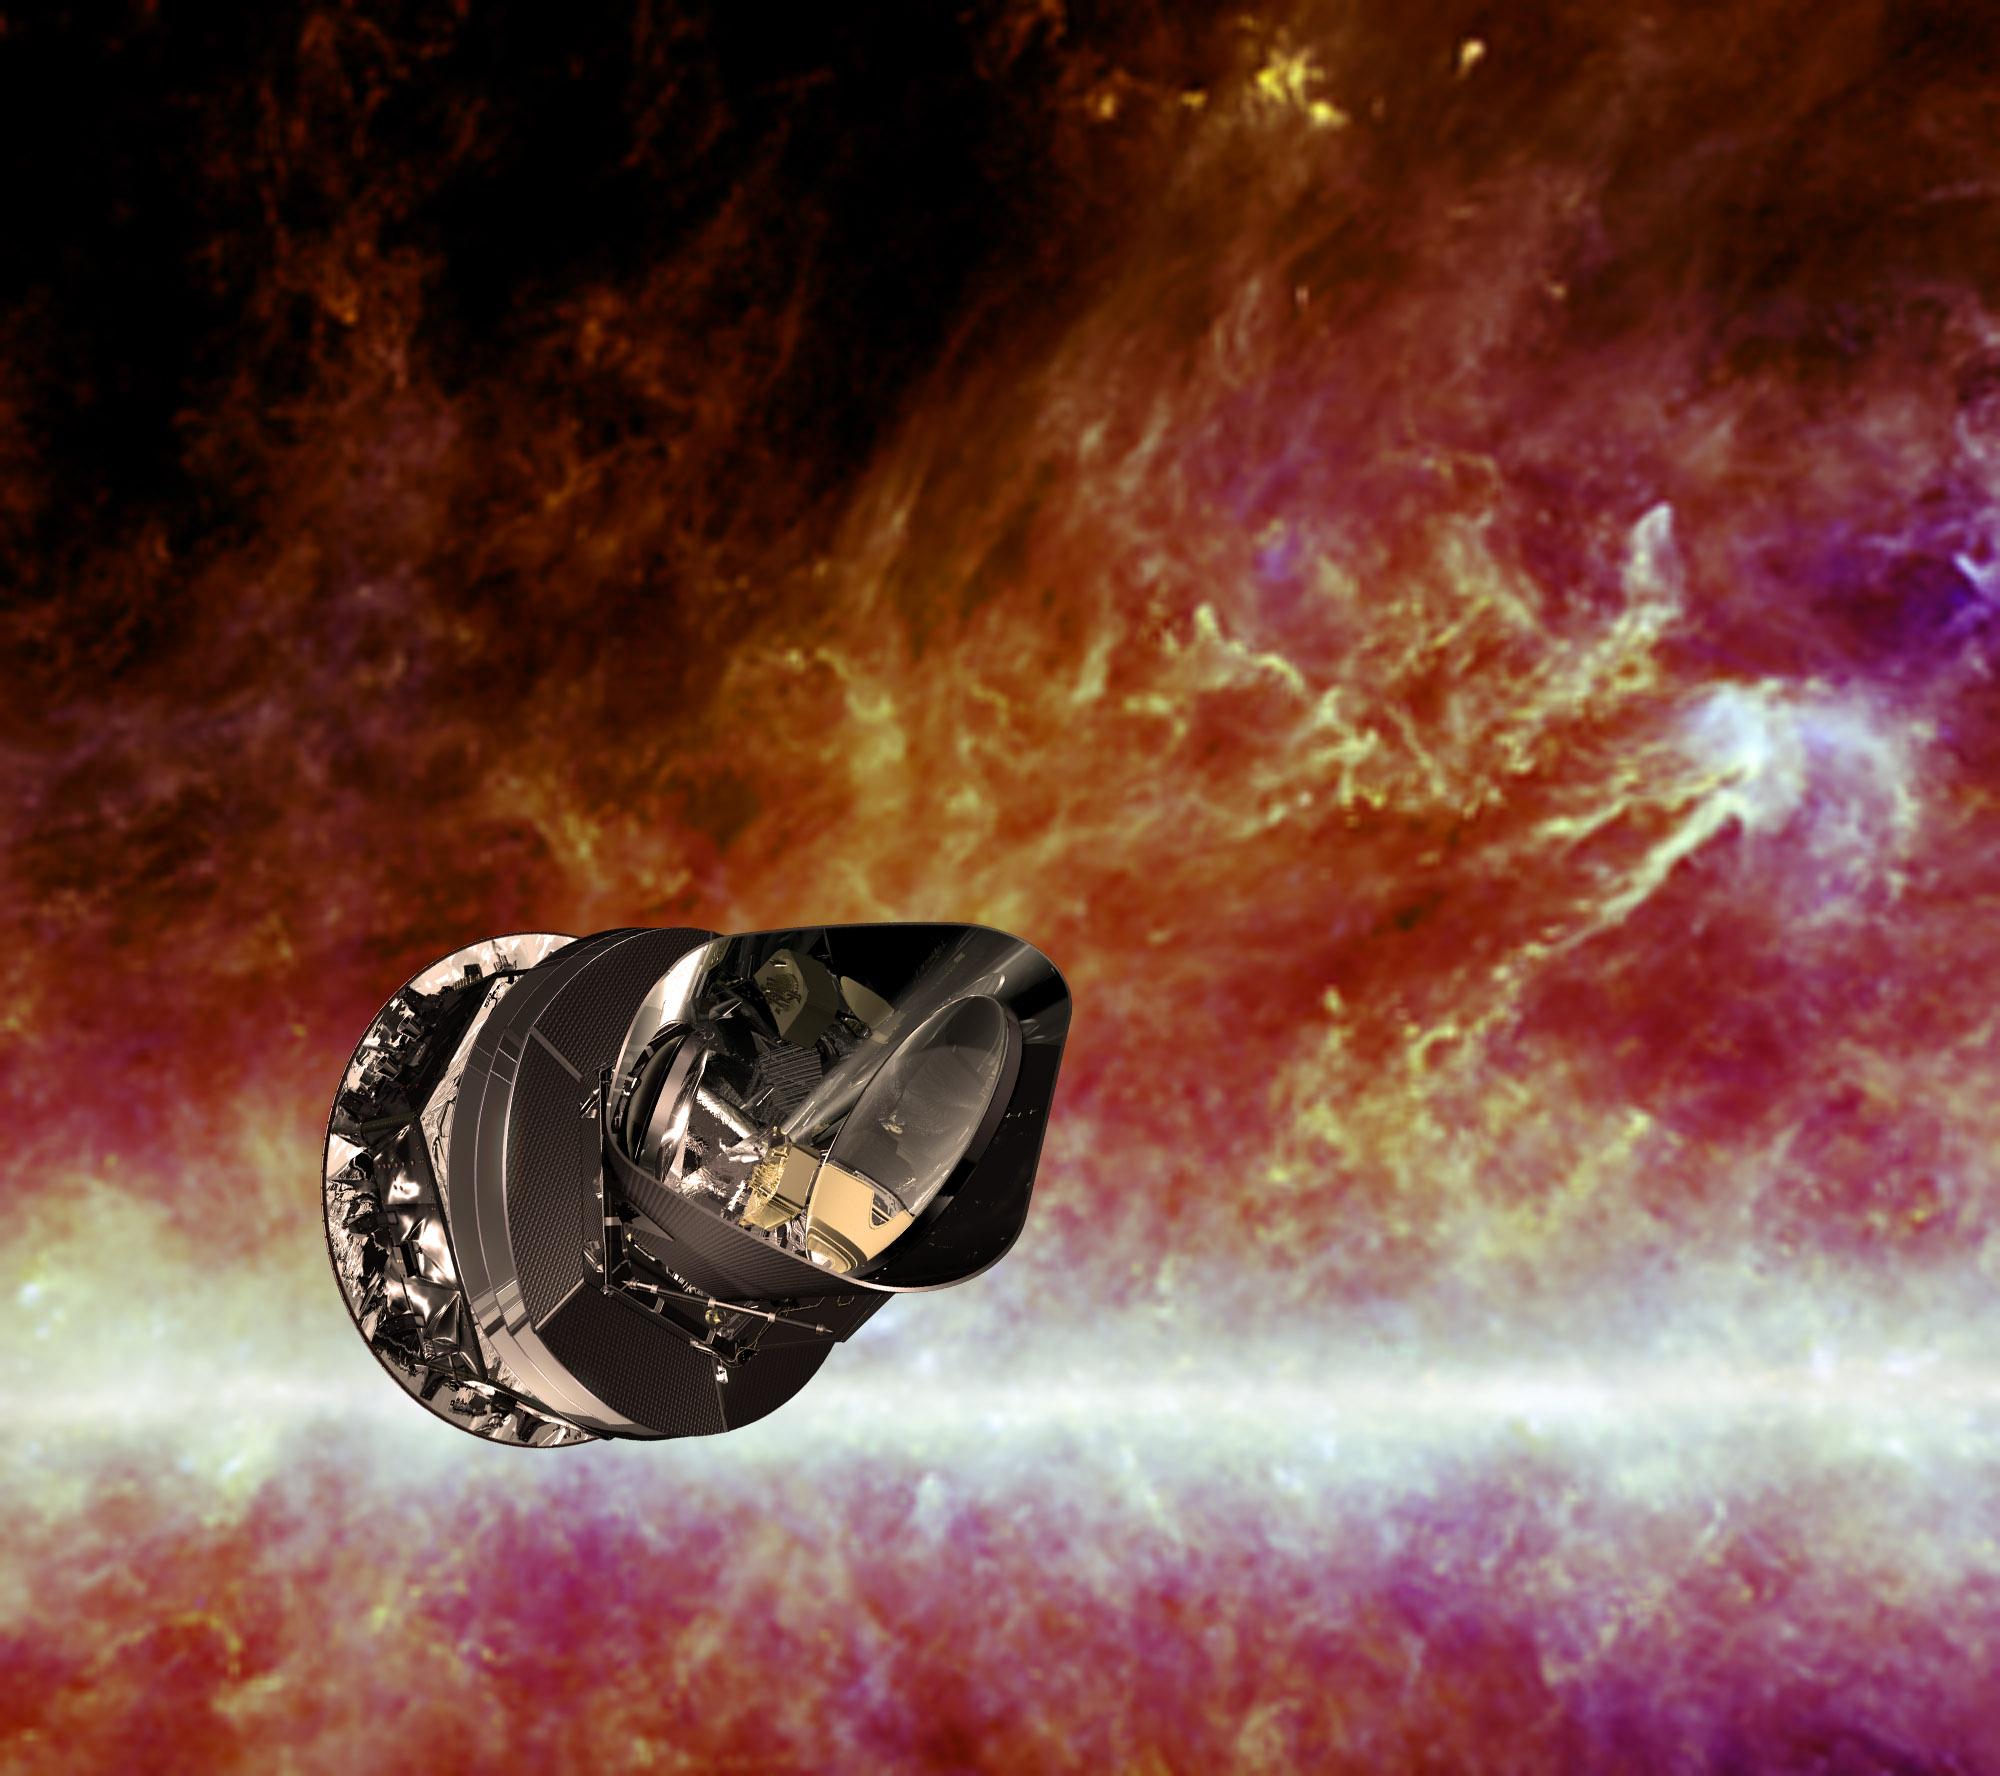 Europe's Planck Space Telescope 'Time Machine' Shuts Down